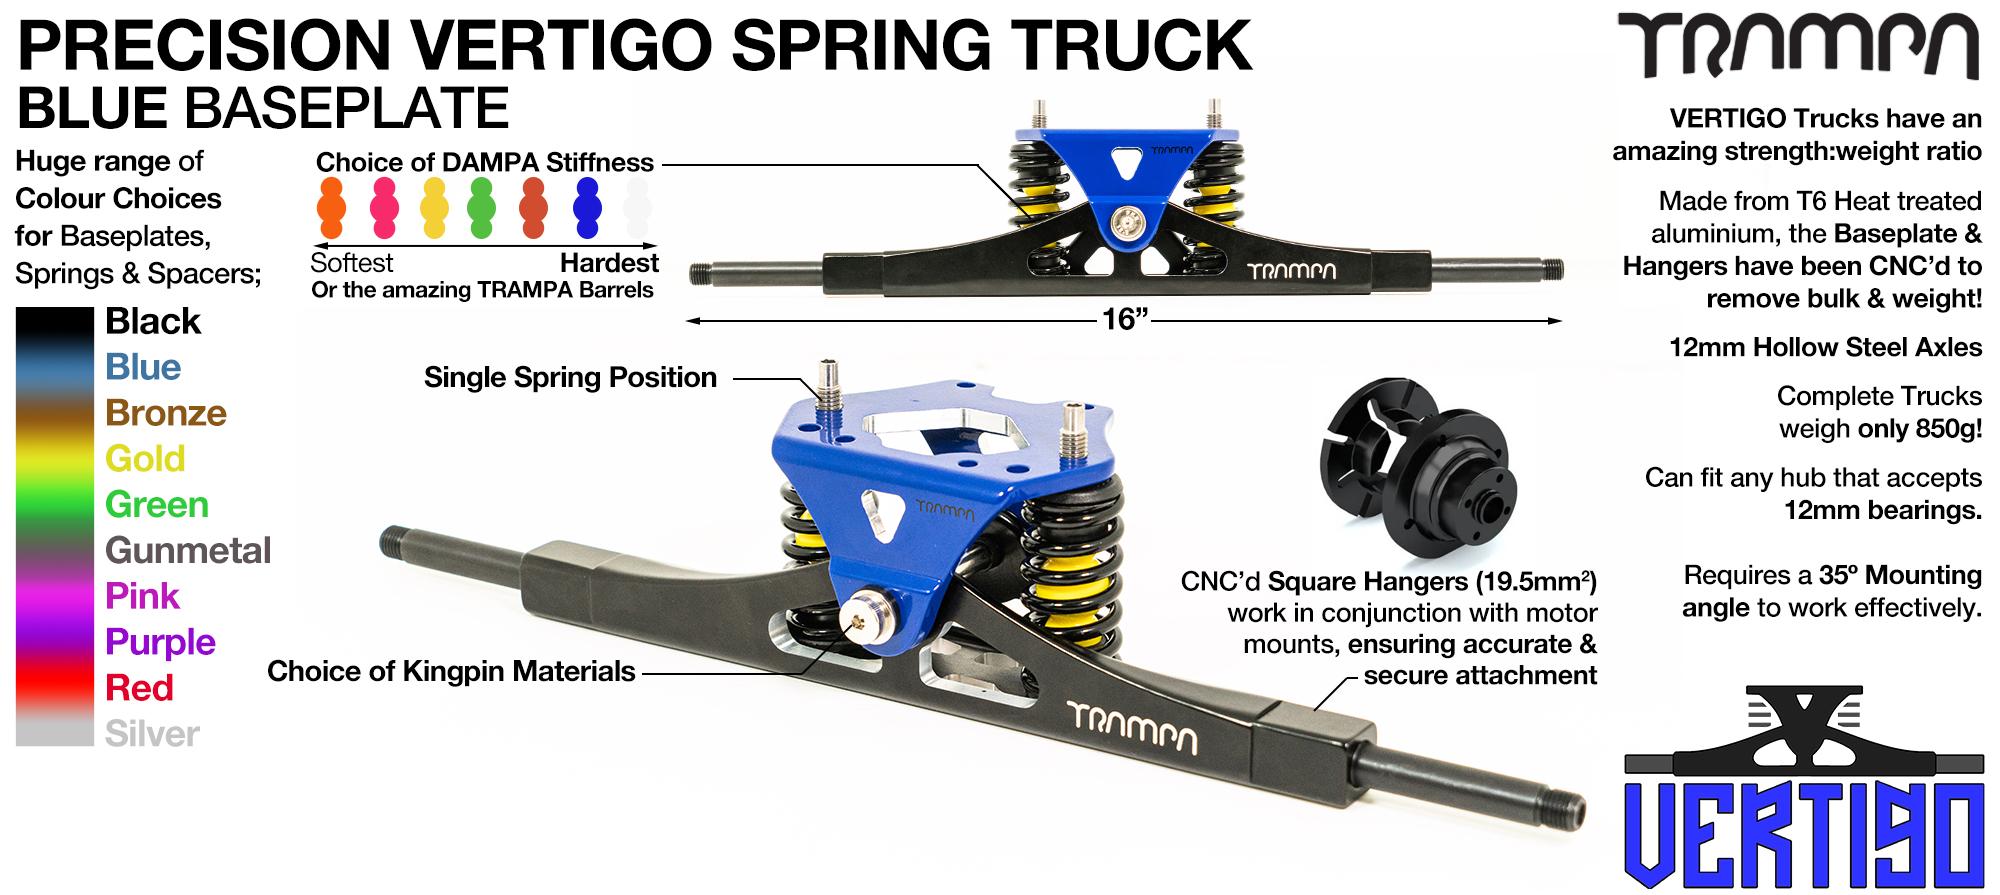 Vertigo Truck - 12mm Hollow Axles with Powder coated Blue CNC Baseplate & Steel kingpin TRAMPA Spring Trucks